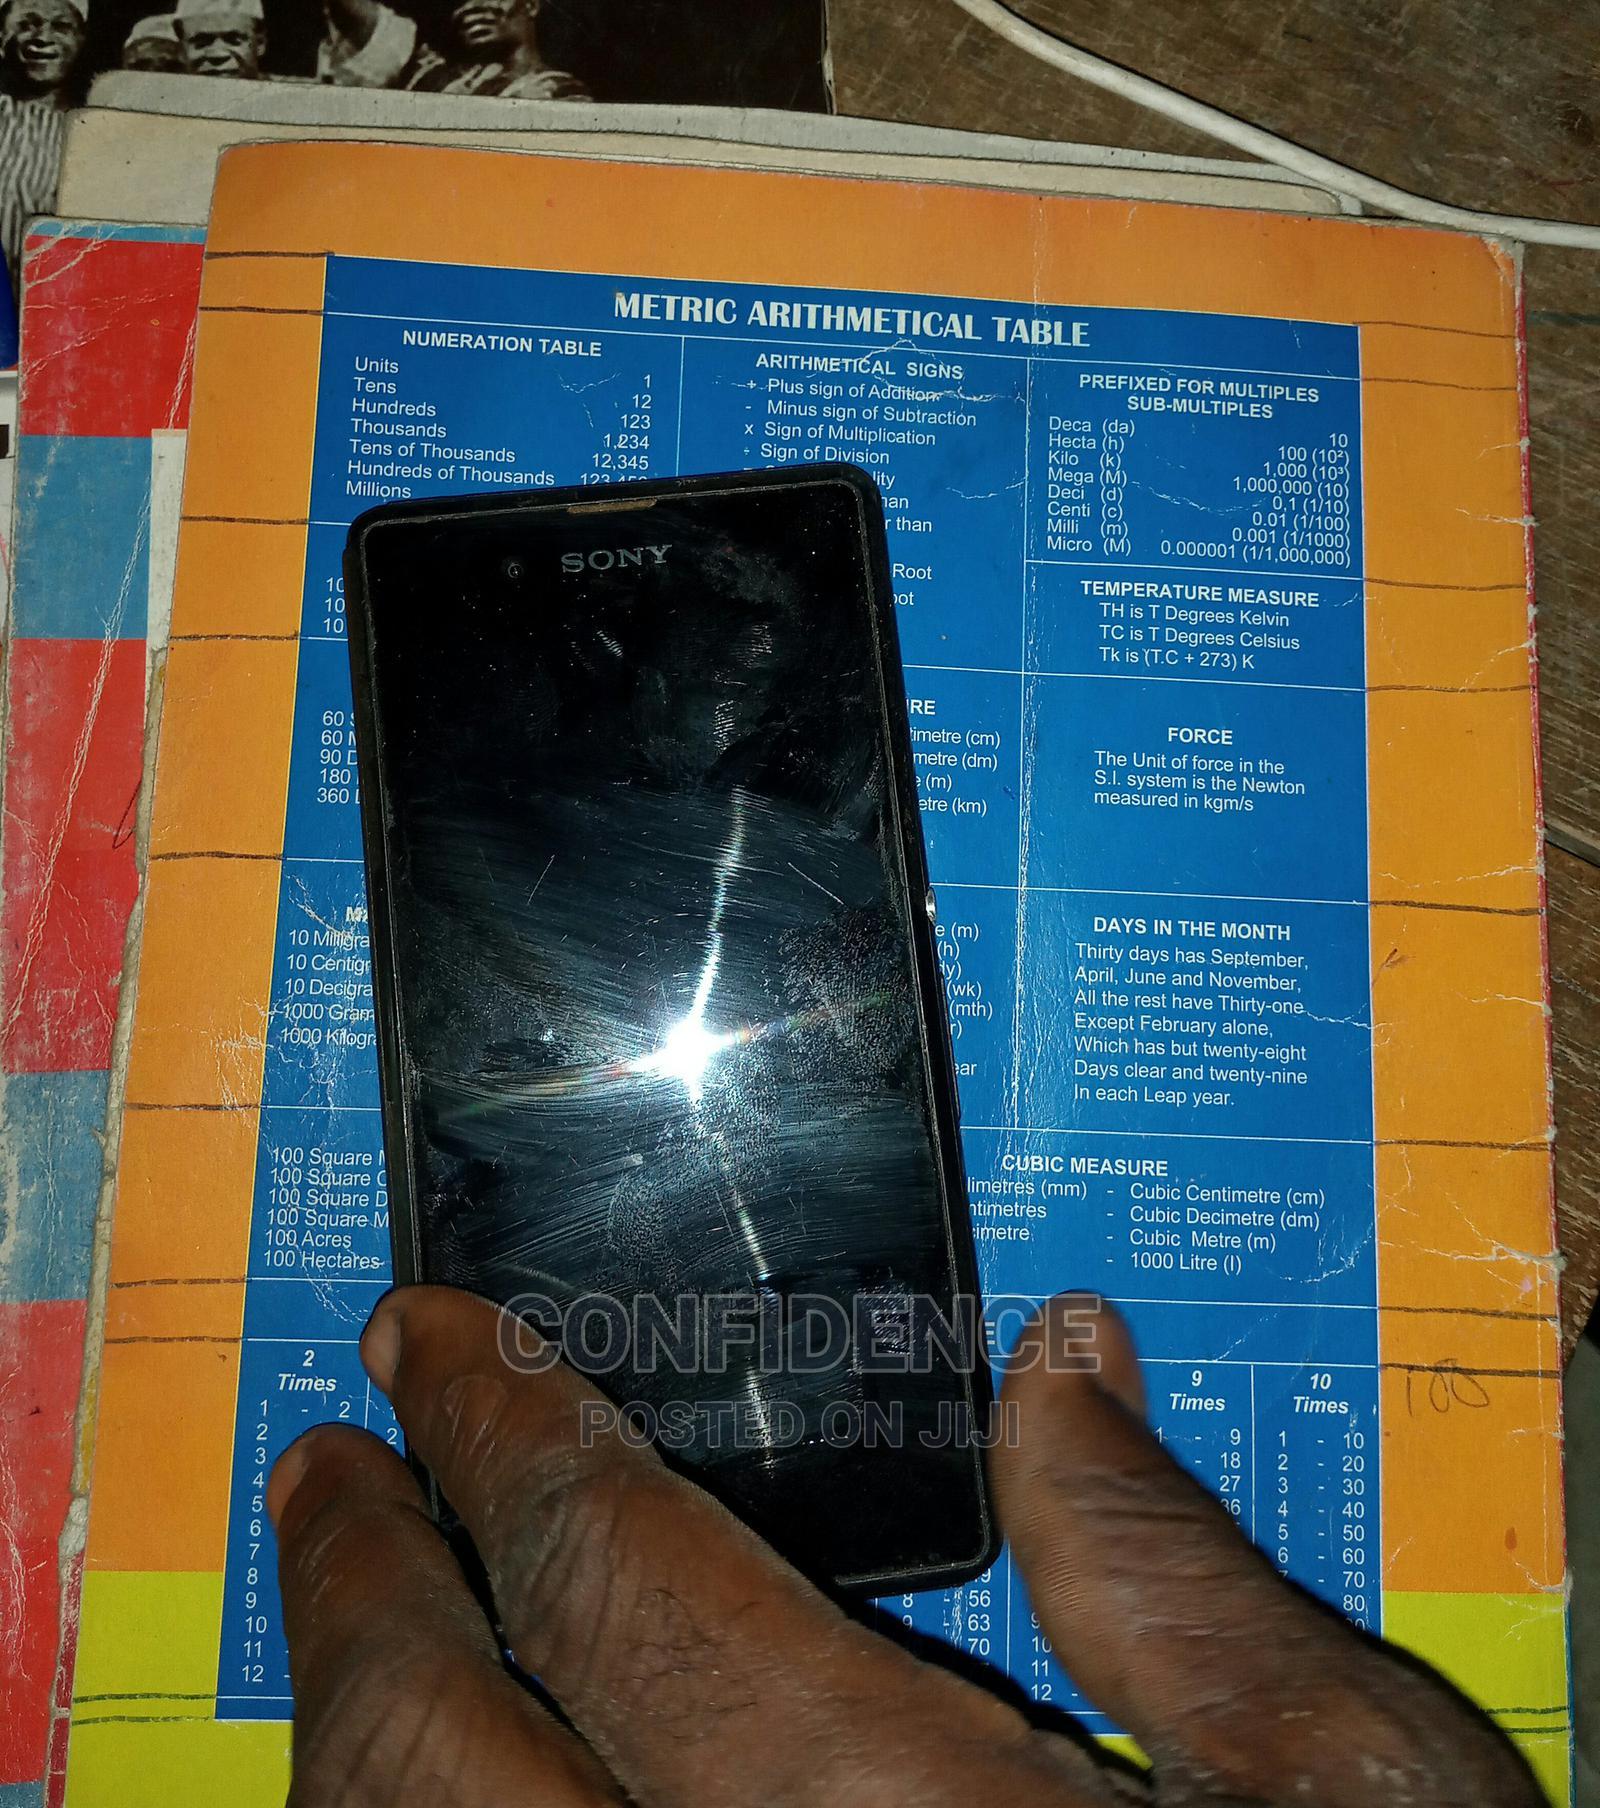 Sony D 2403 8 GB Black | Mobile Phones for sale in Atwima Mponua, Ashanti, Ghana